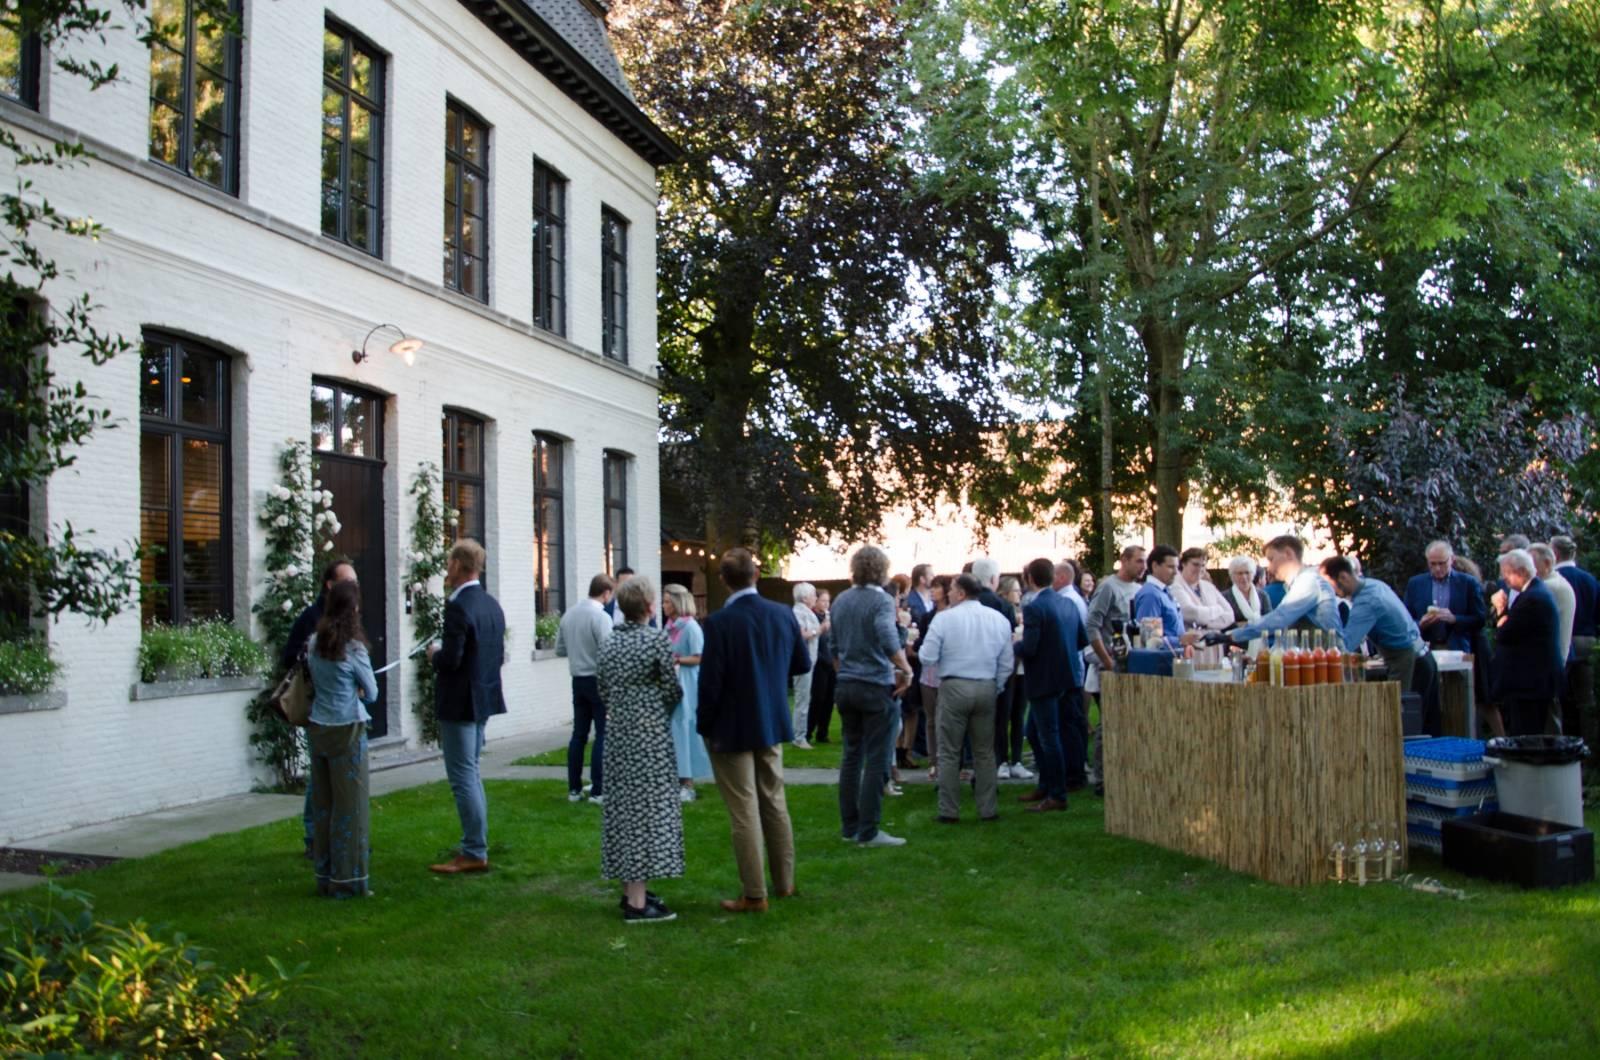 Pastorie Caeneghem - Eventlocatie - House of Events - 50